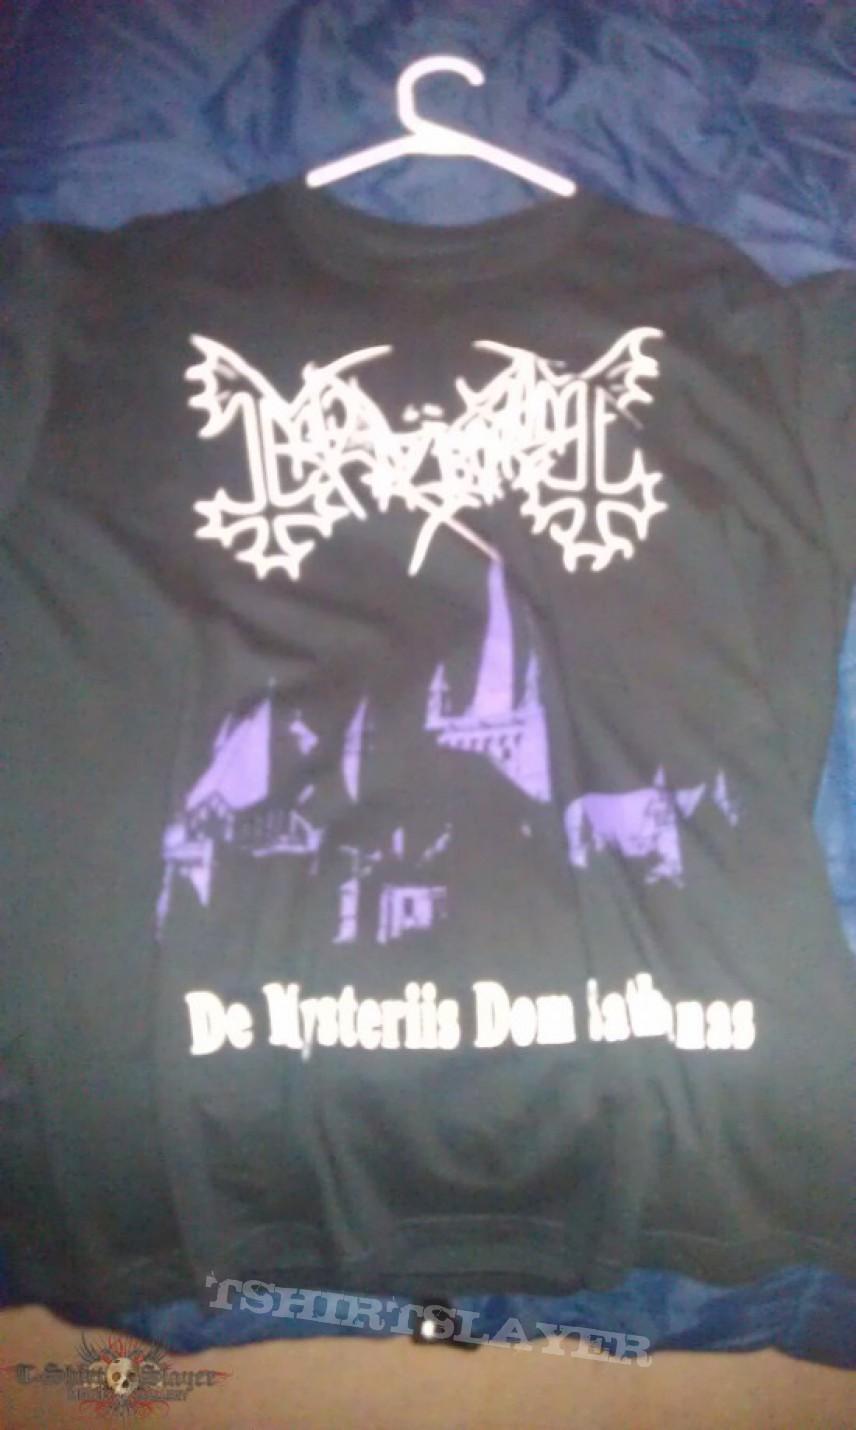 "TShirt or Longsleeve - Mayhem tshirt"" de mysteriis dom sathanas"""